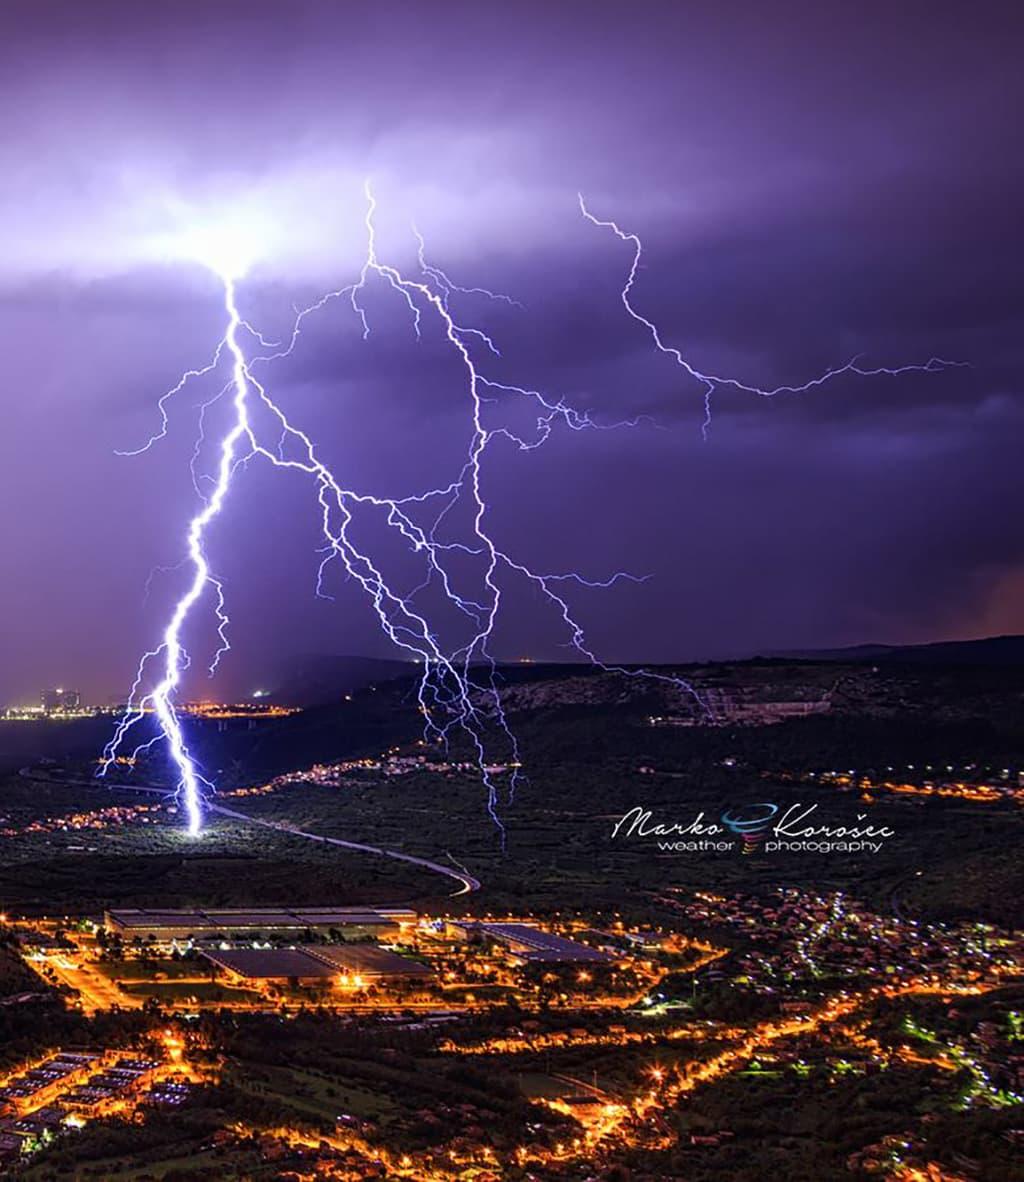 Lightning strikes Trieste, Italy suburbs. Taken 2 nights ago, Sept 4th.